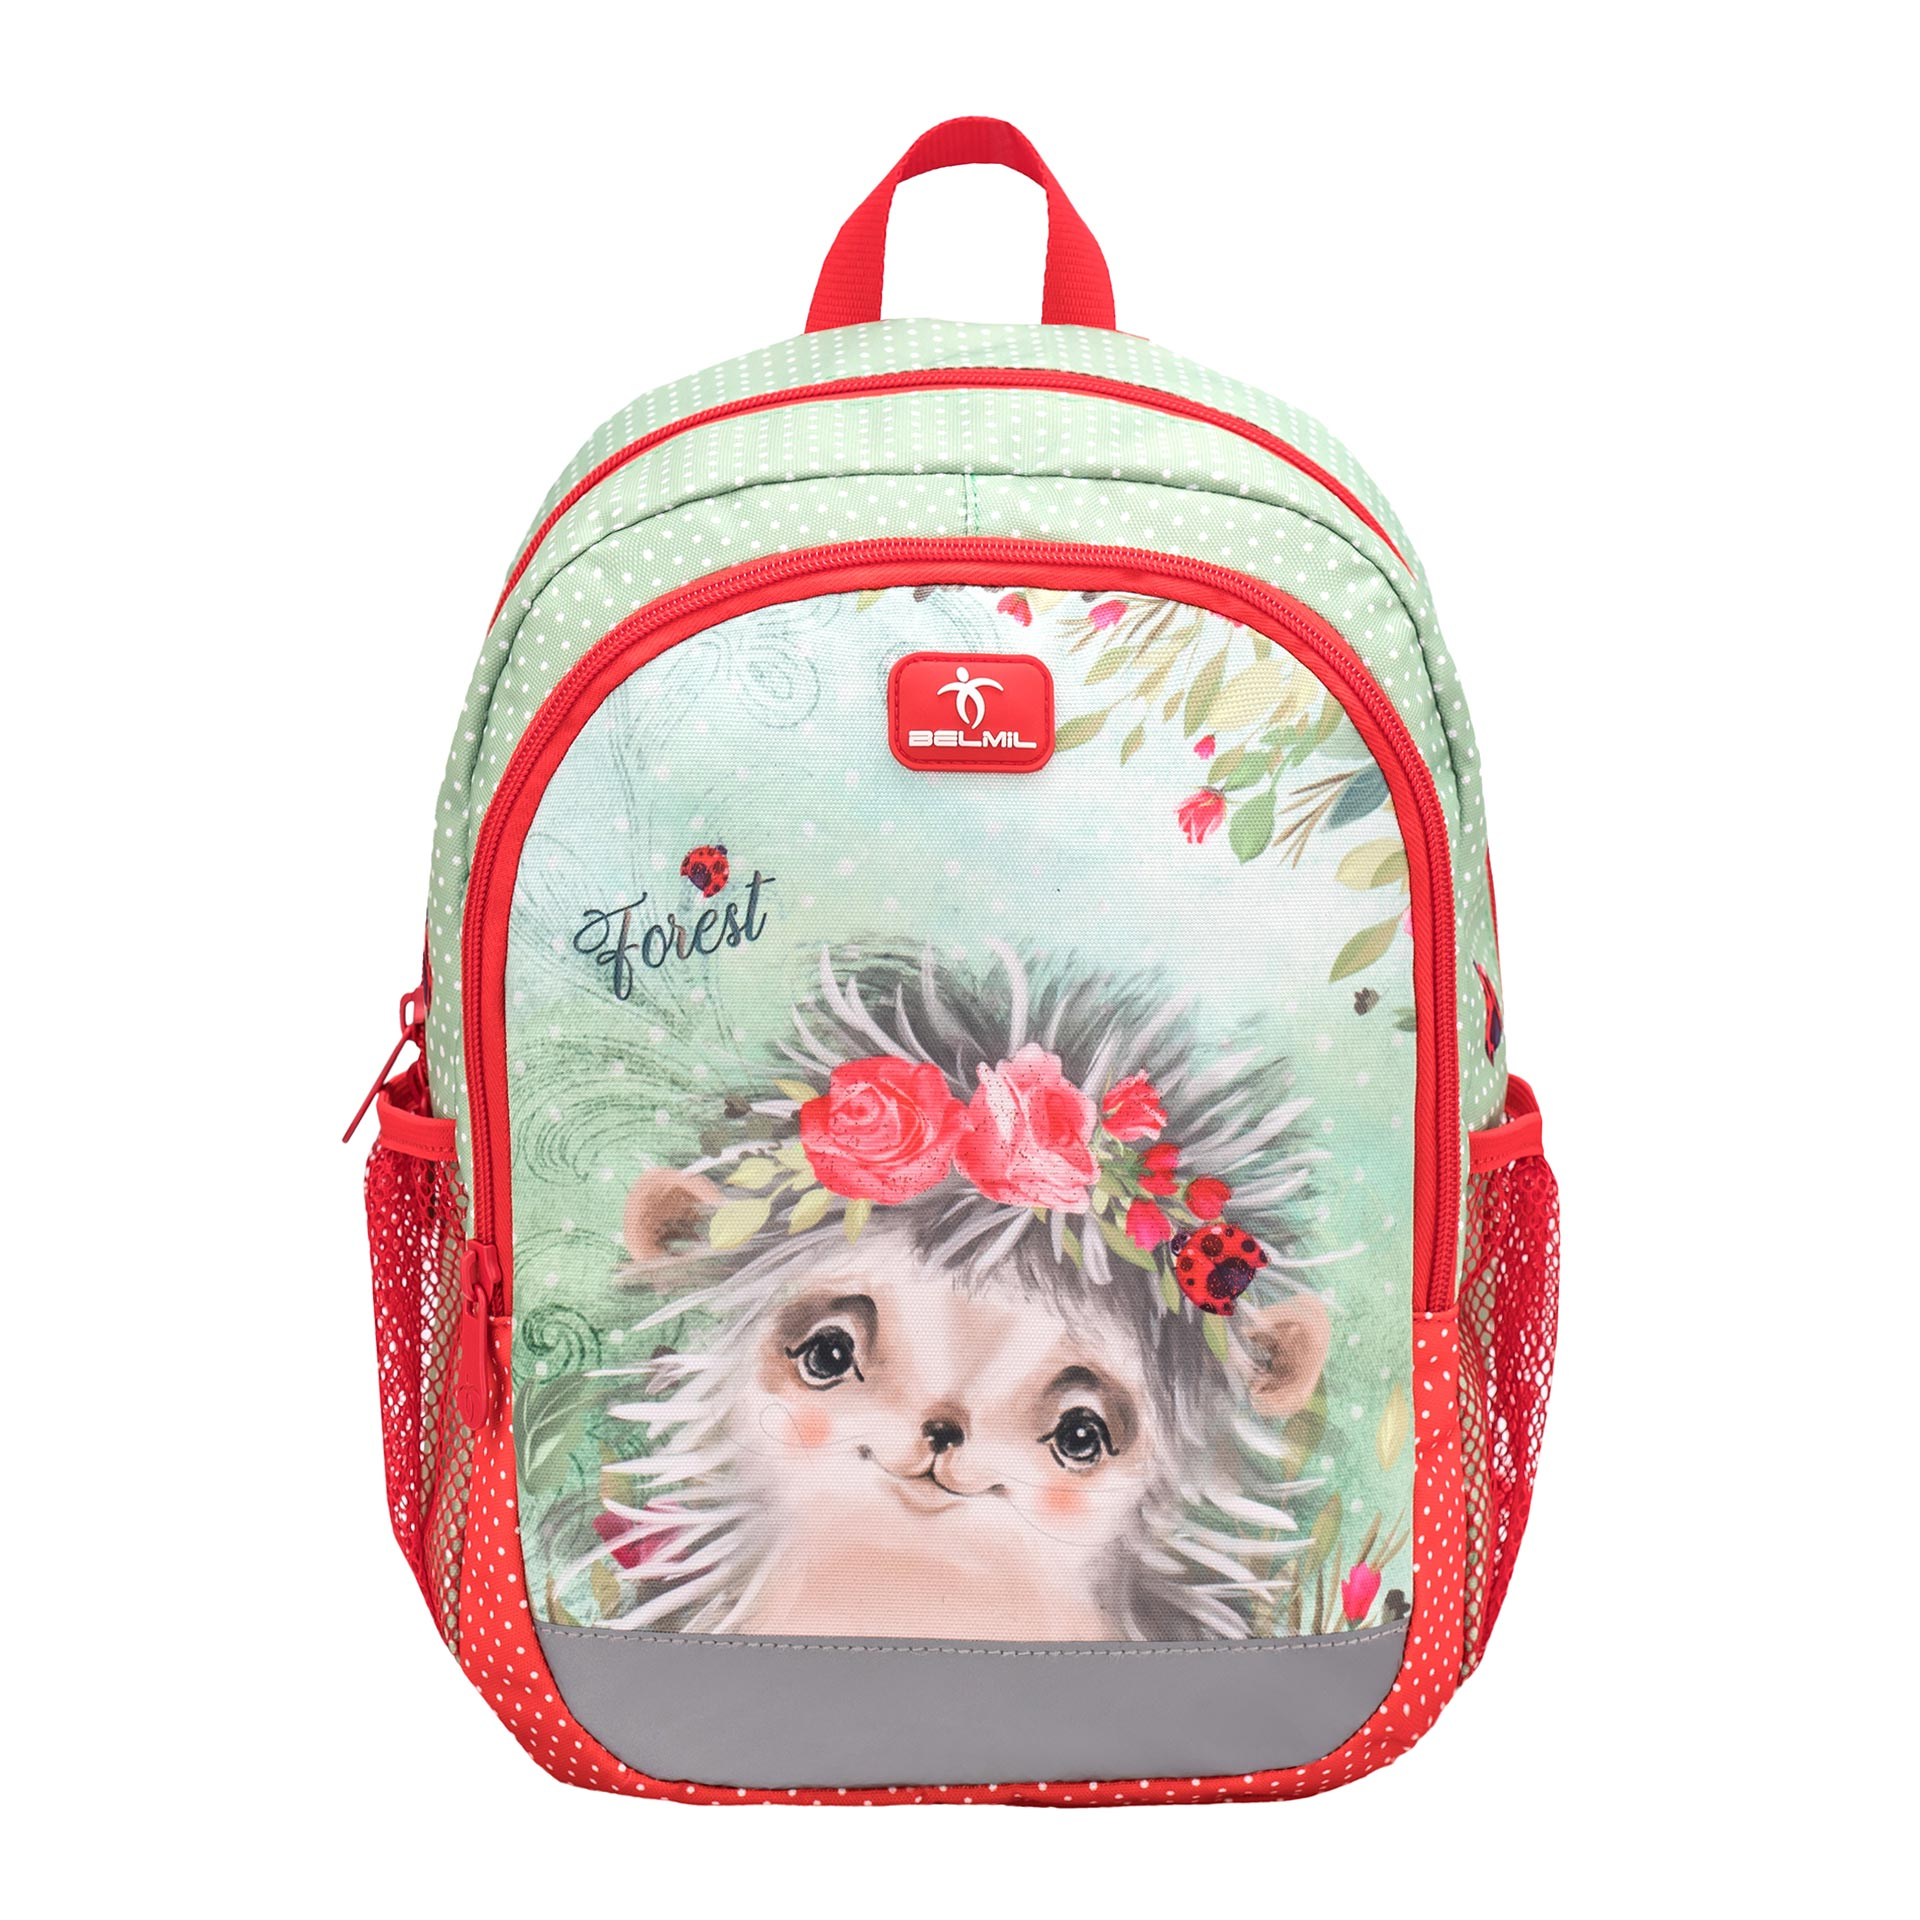 Belmil Kiddy Plus Kinderrucksack Animal Forest Hedgehog